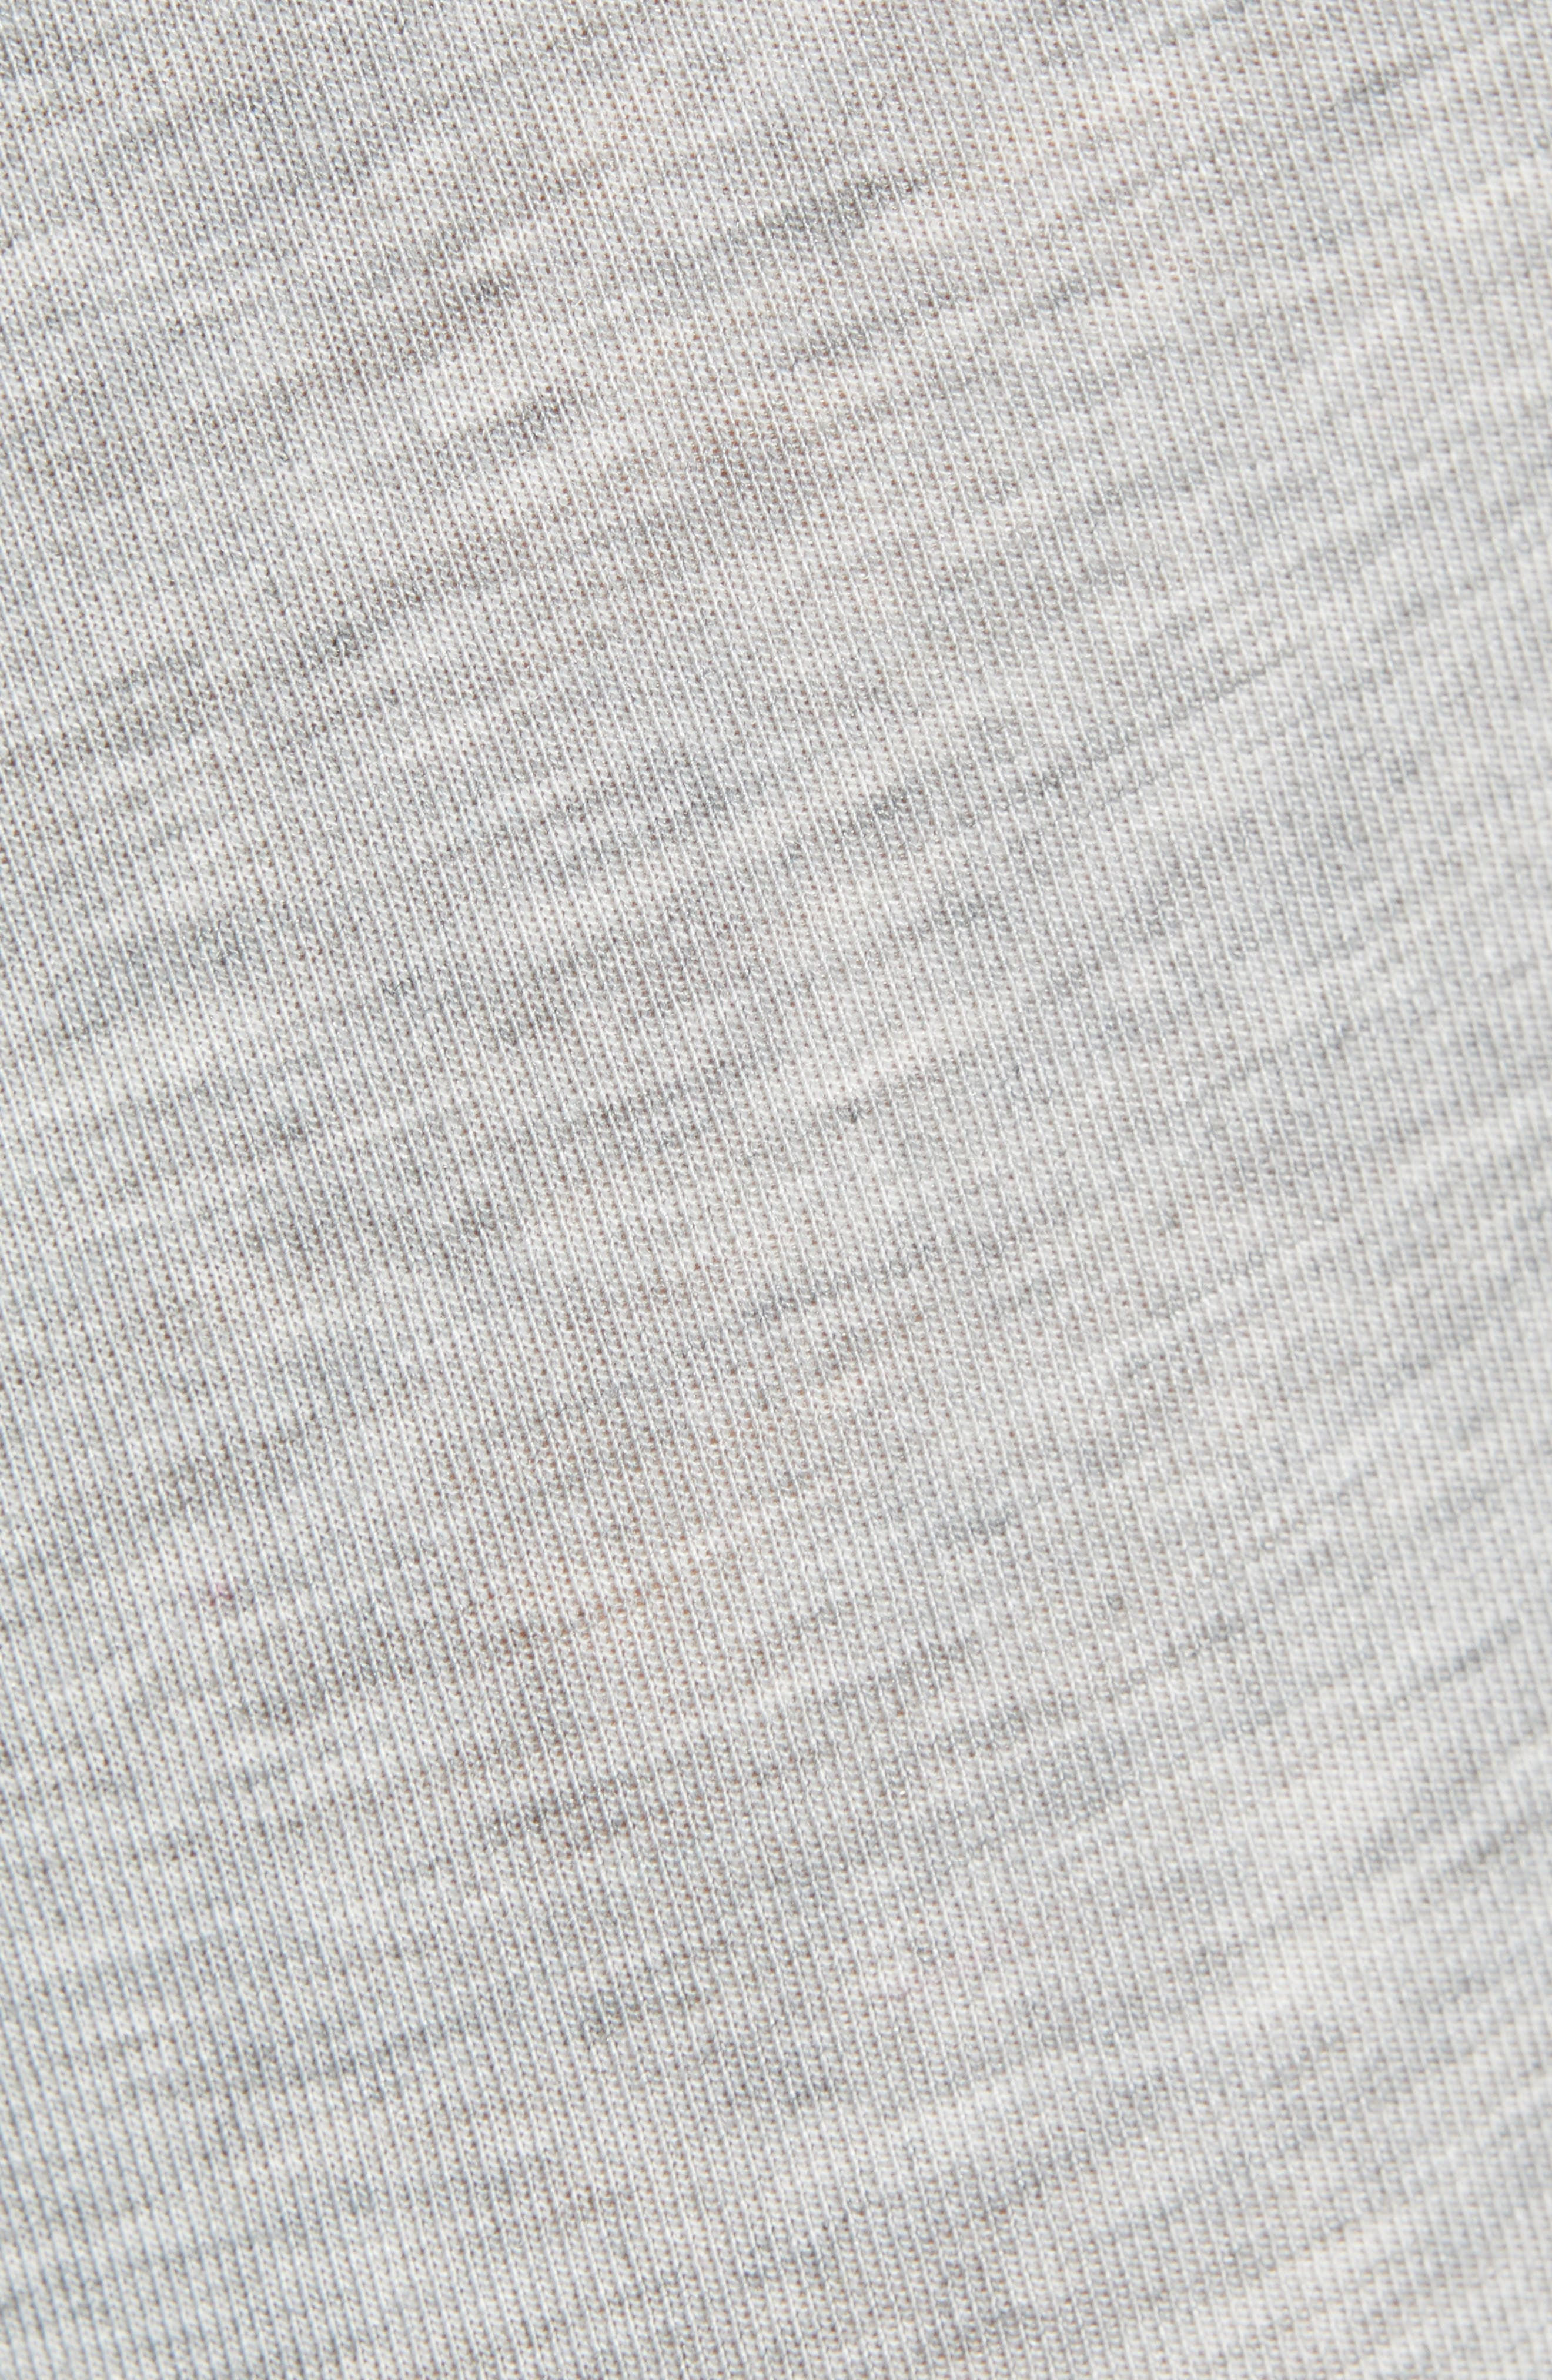 CALVIN KLEIN, Ultrasoft Stretch Modal Trunks, Alternate thumbnail 5, color, GREY HEATHER/ WHITE